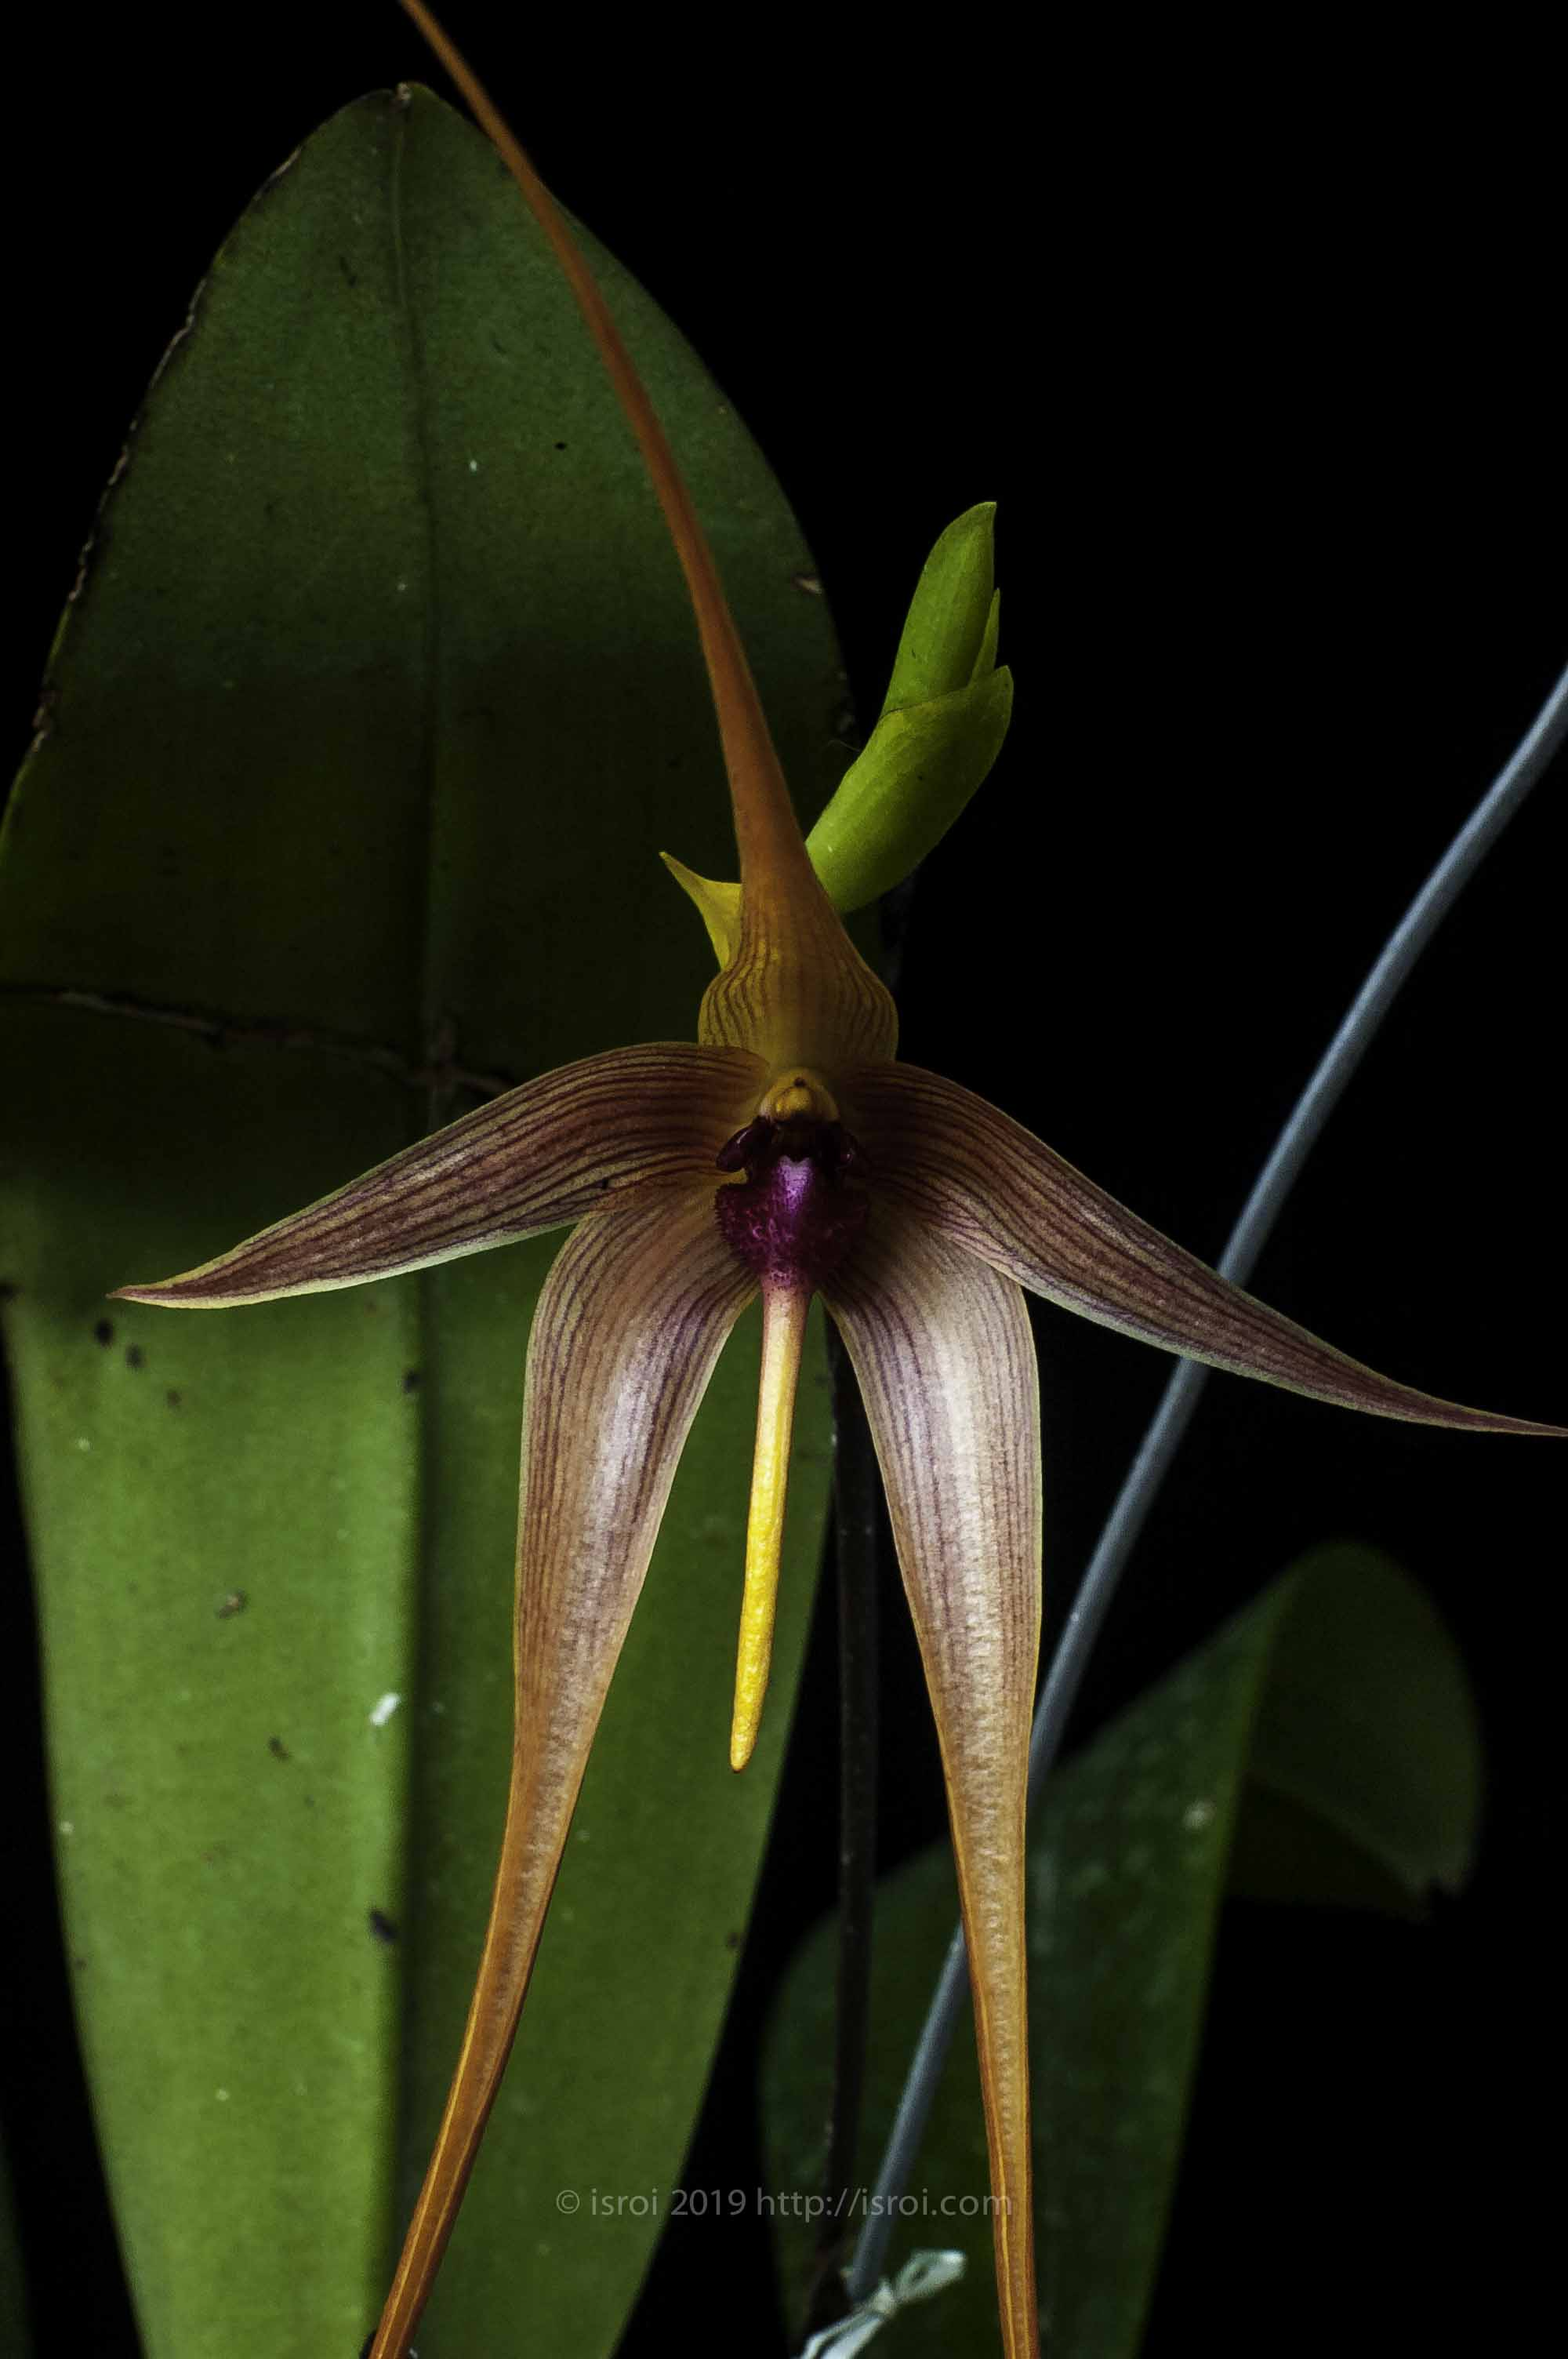 Anggrek spesies Indonesia Bulbophyllum echinolabium dari Maluku